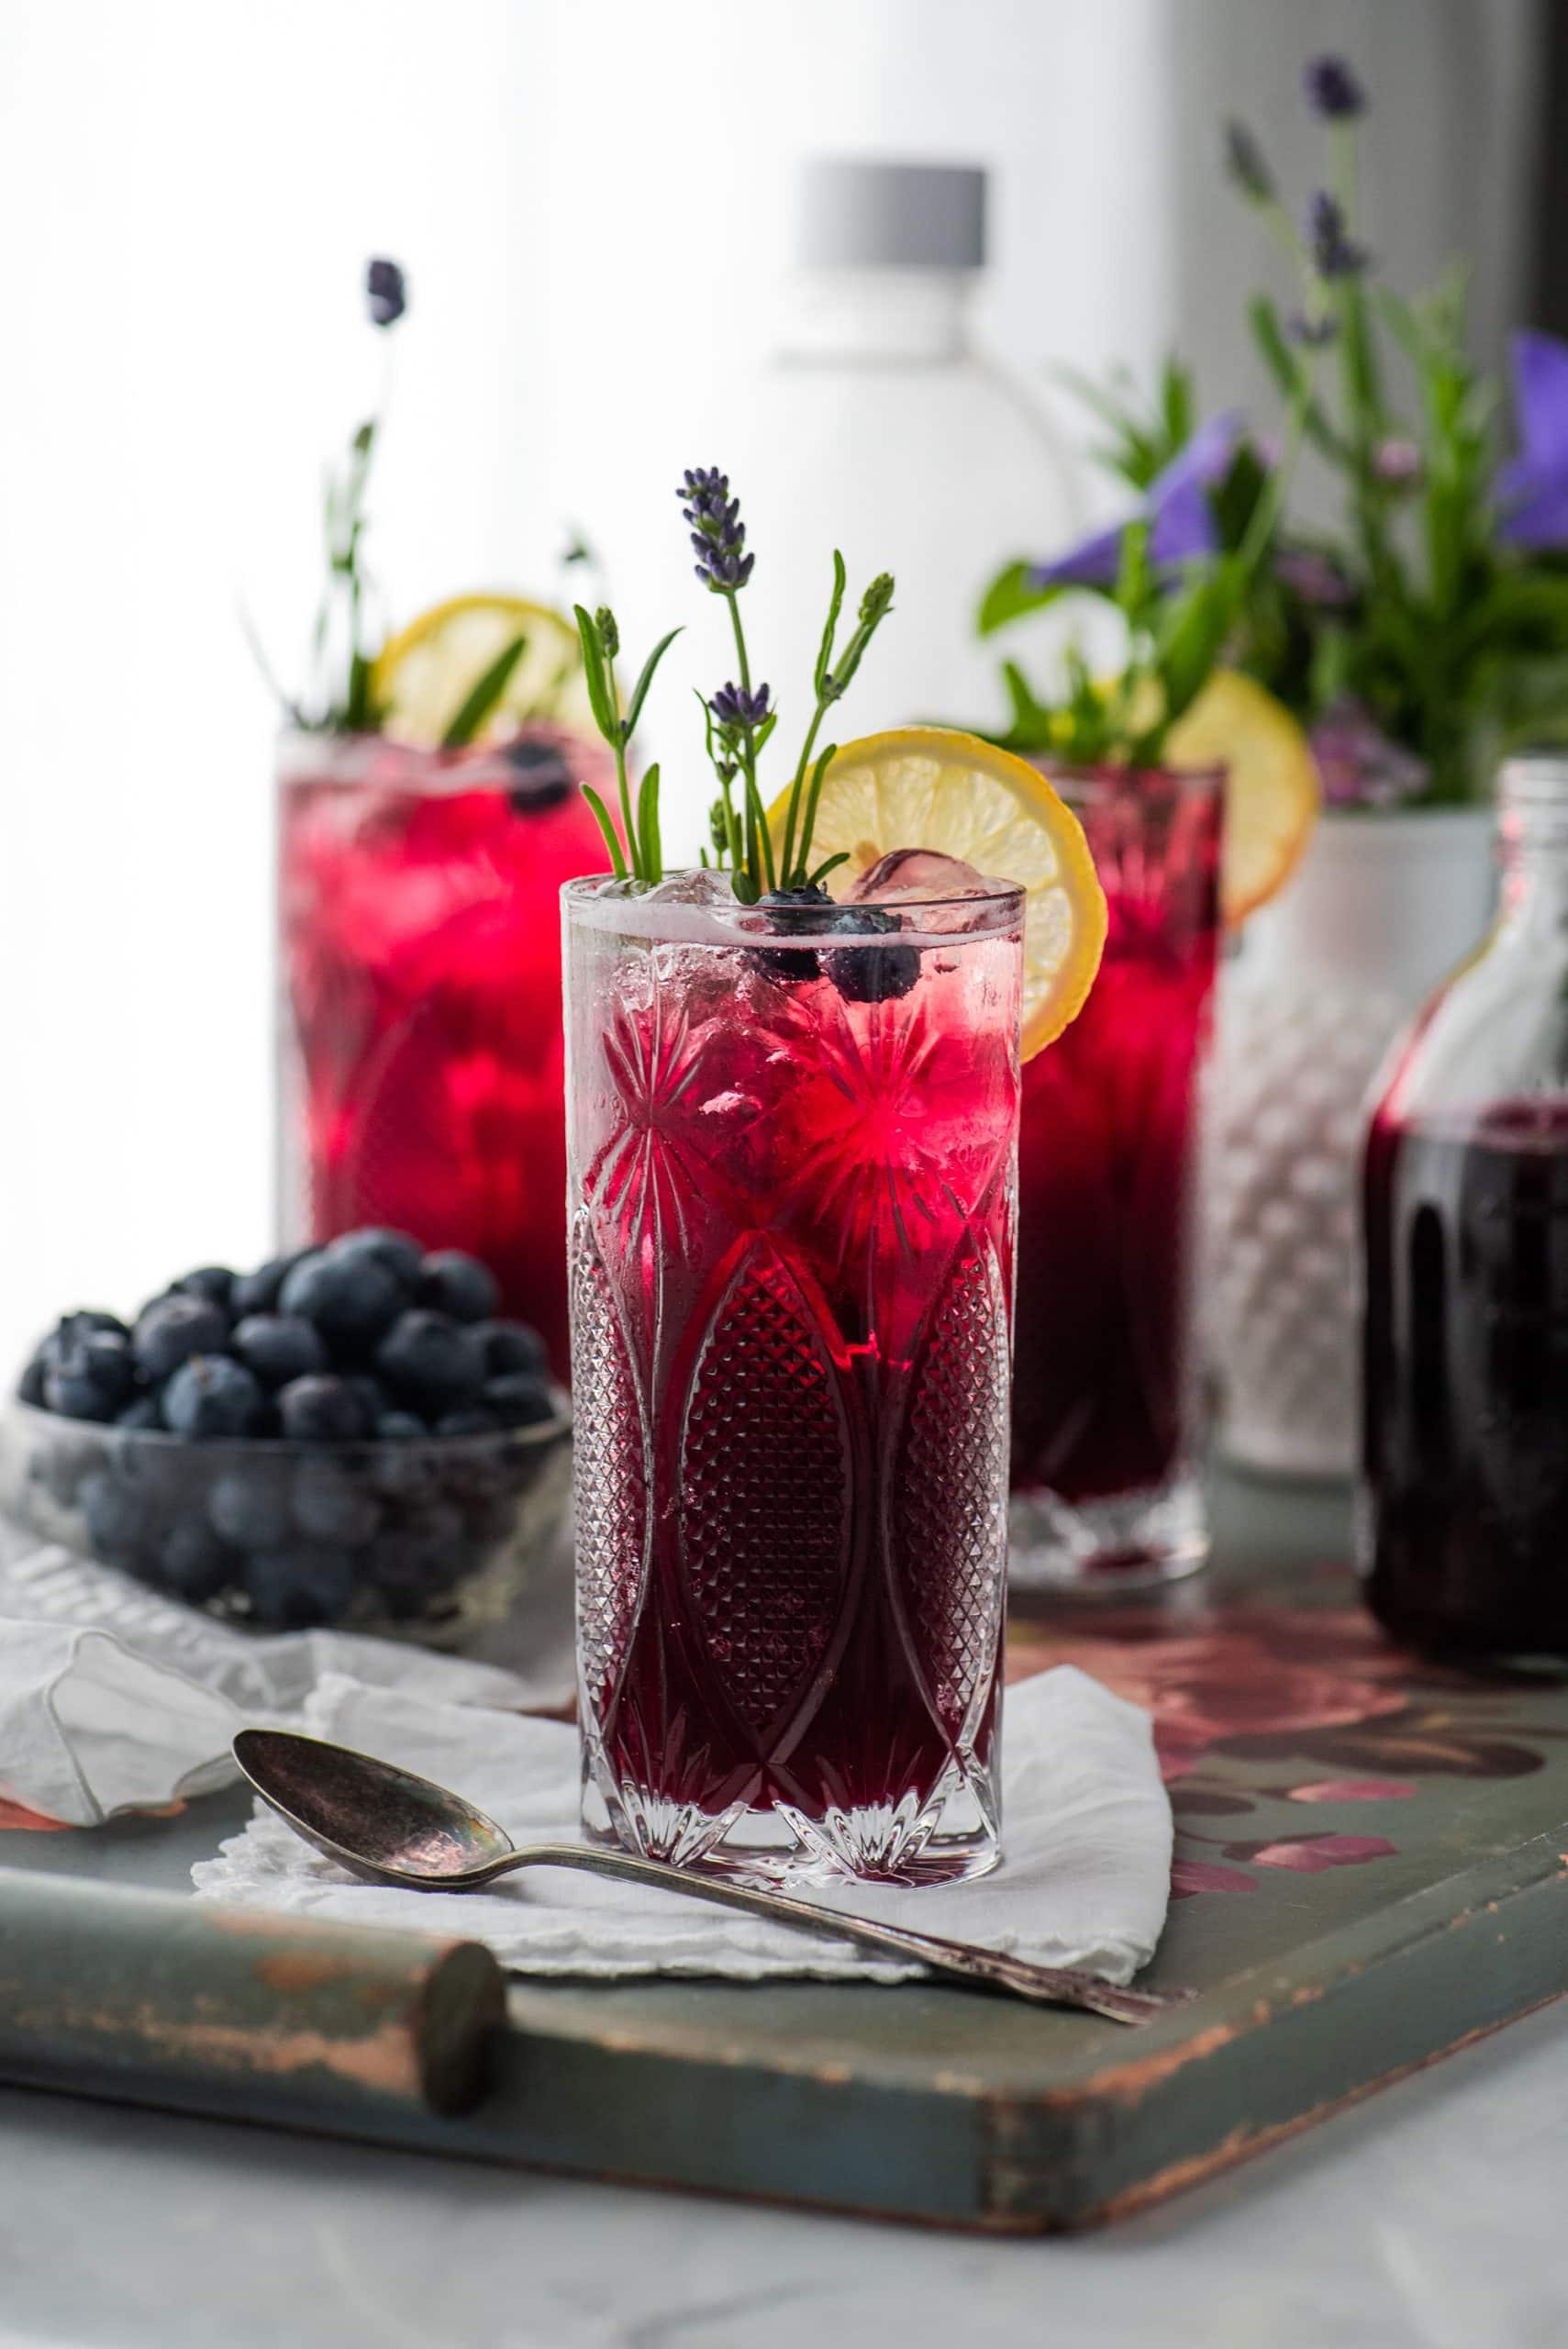 Blueberry Lavender Soda 6905 scaled - Blueberry Lavender Soda